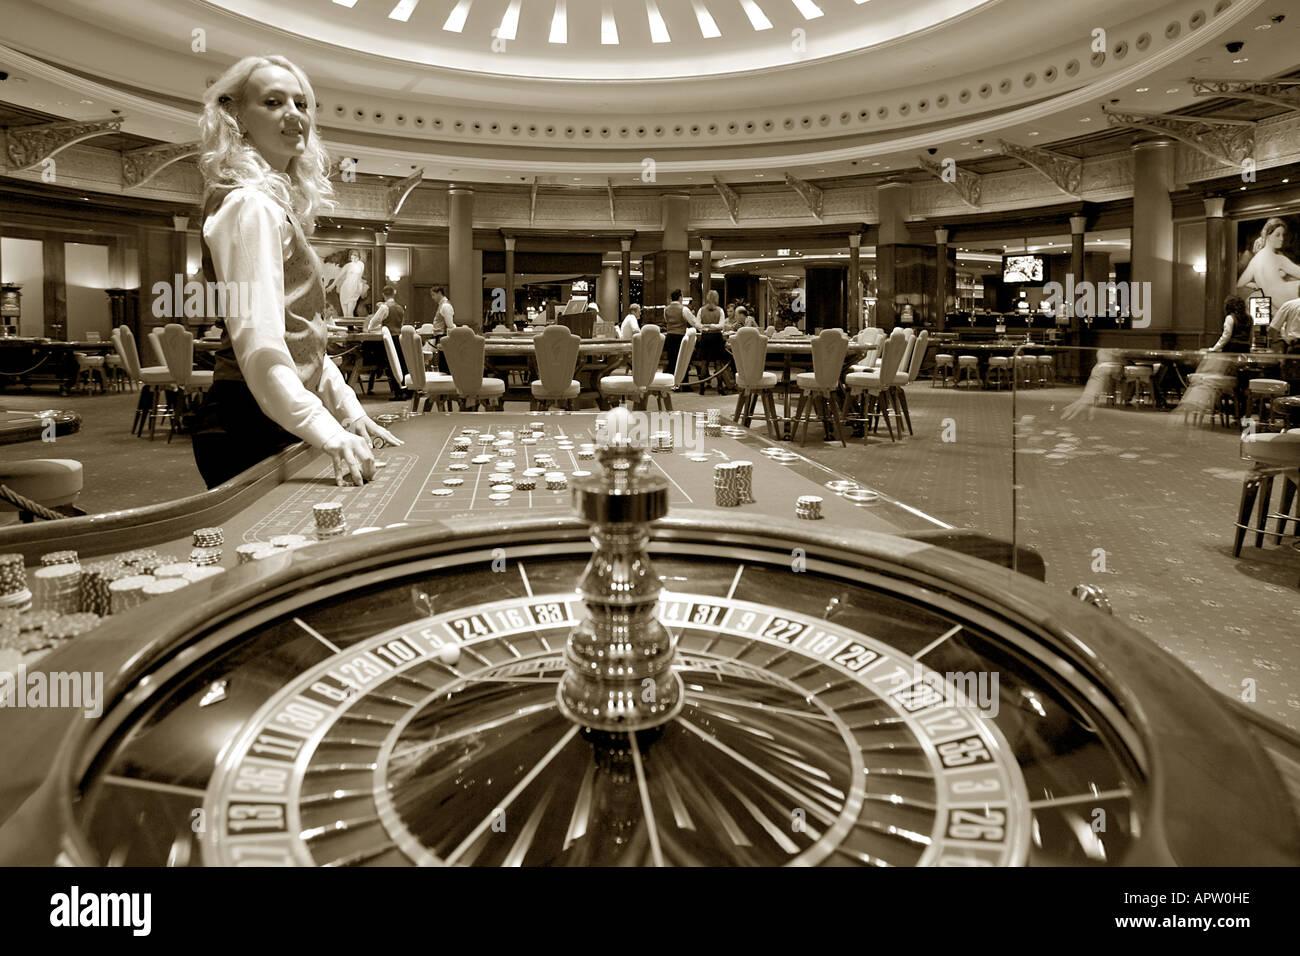 Wooden roulette buy black wooden roulette blackjack table led - Casino Roulette Gaming House Gambling Club Plaything Pledge Casinos Wheel Addiction Easy Money Dollar Pound Ball